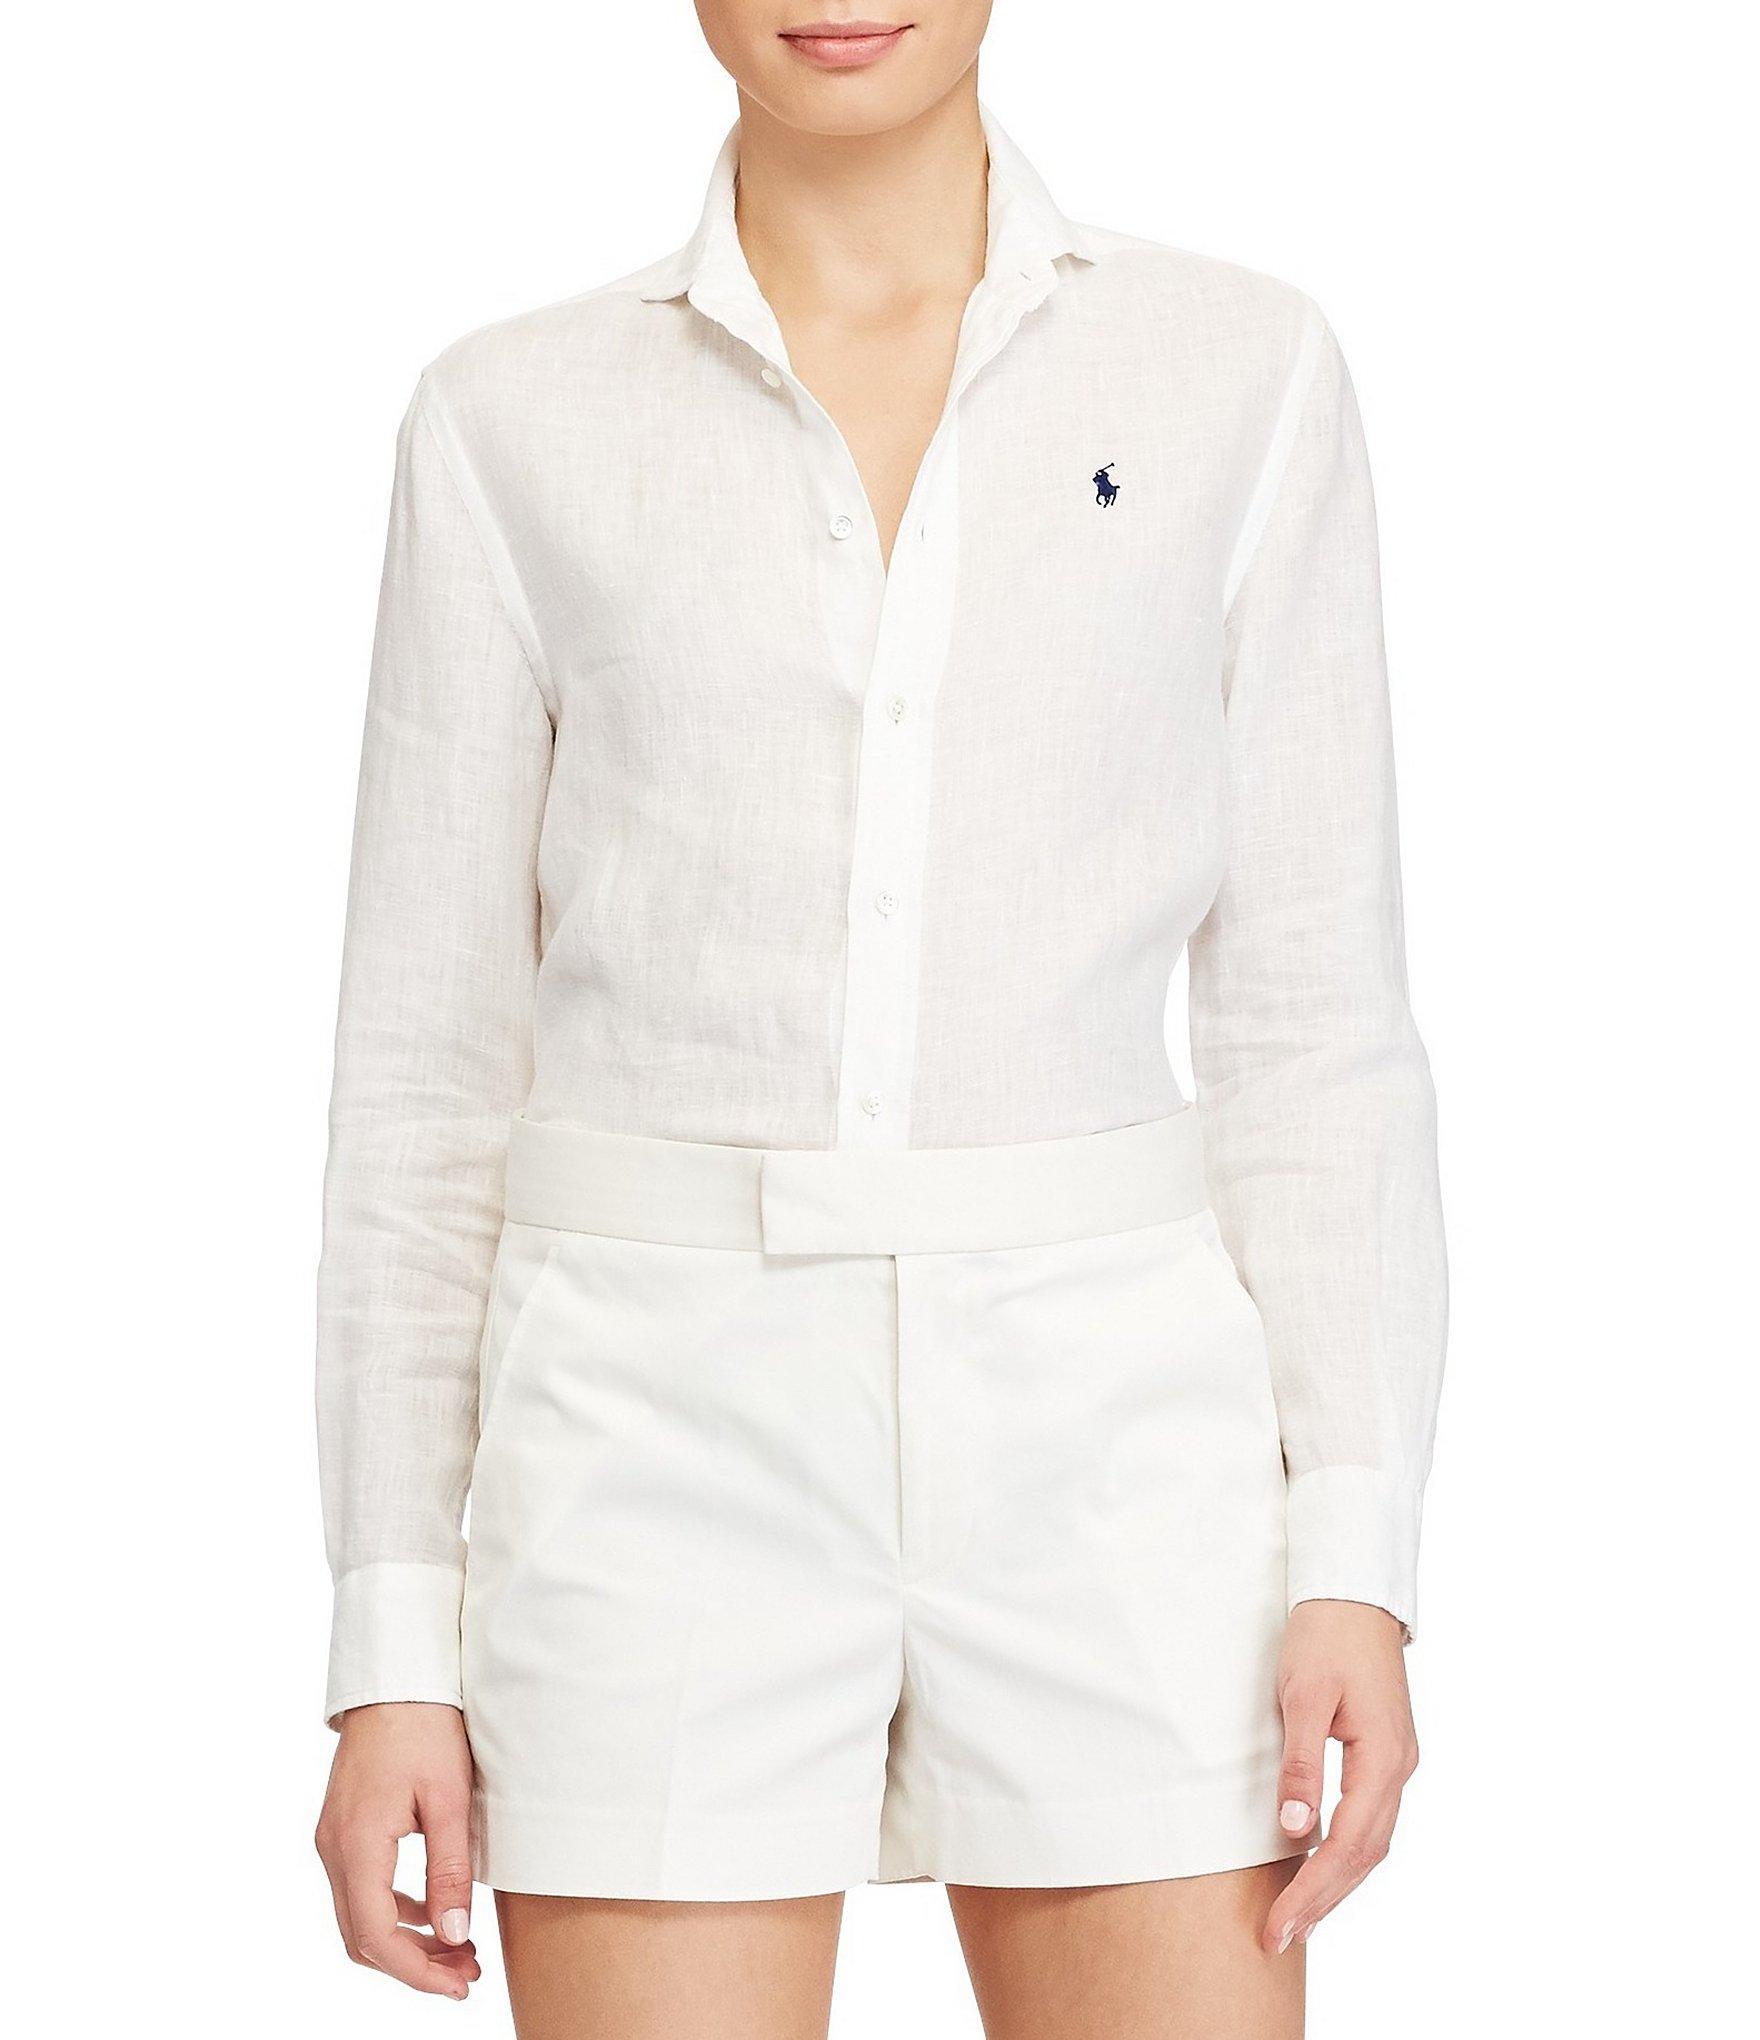 e5ee2235a87 Lyst - Polo Ralph Lauren Relaxed Fit Linen Shirt in White